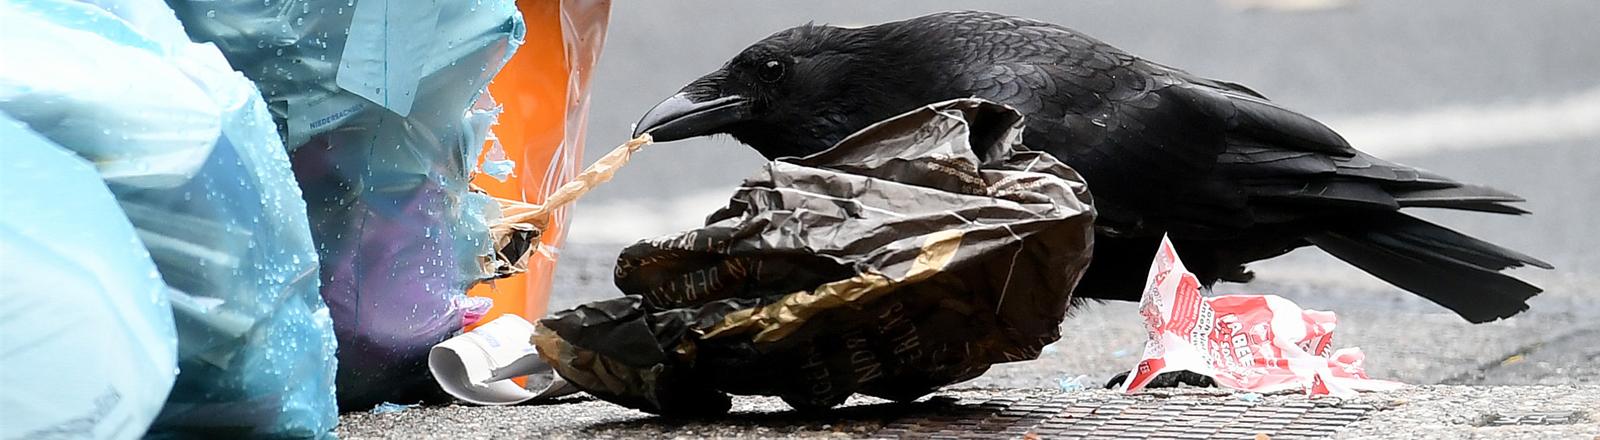 Krähe wühlt im Müll